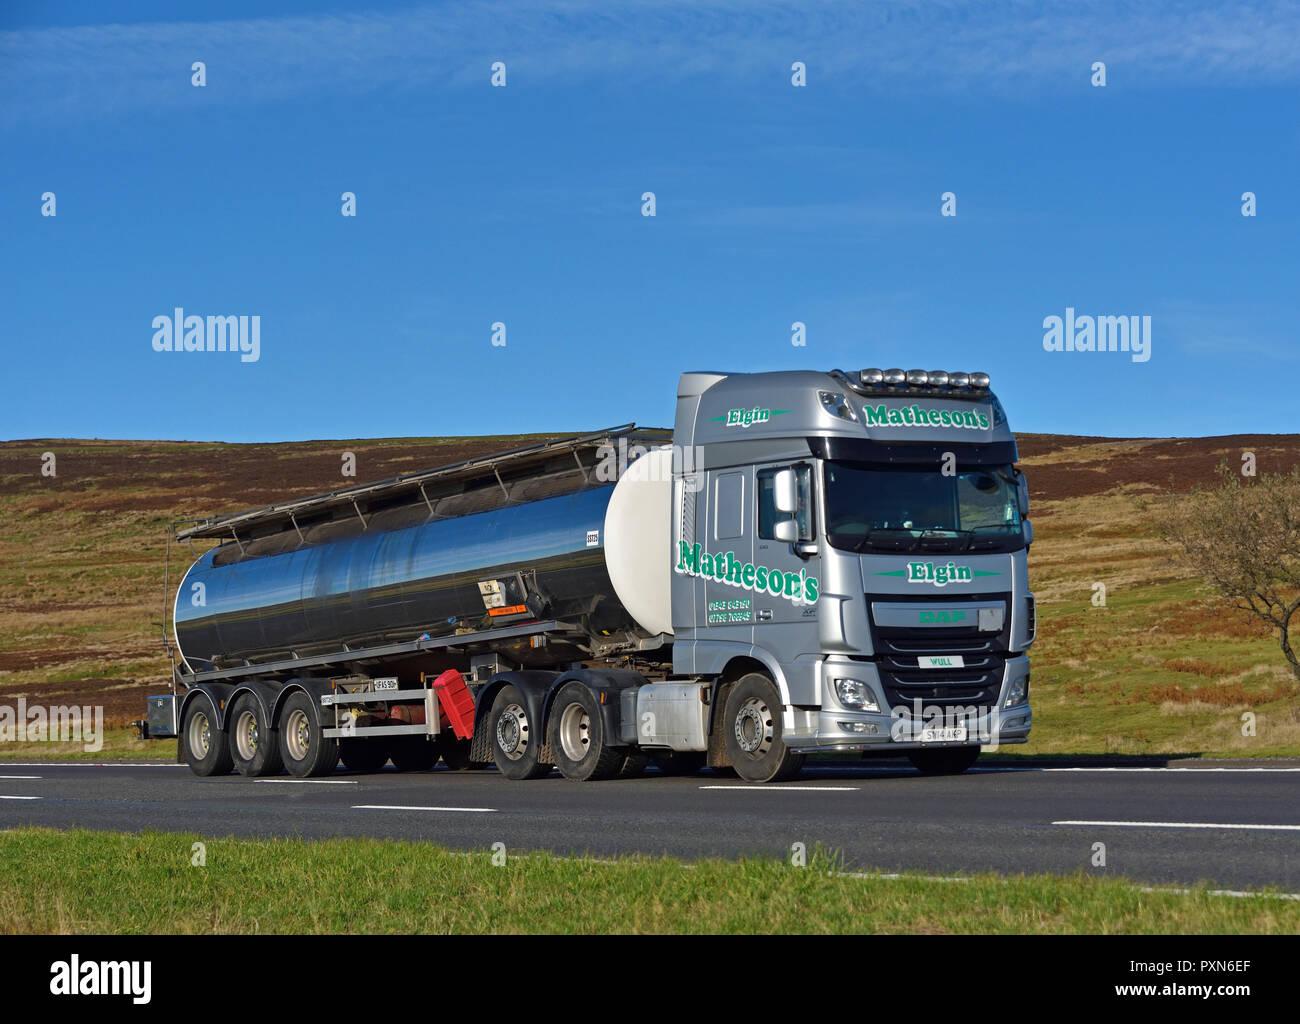 Matheson's Limited Bulk Haulage Tanker. M6 motorway Southbound carriageway, Shap, Cumbria, England, United Kingdom, Europe. - Stock Image